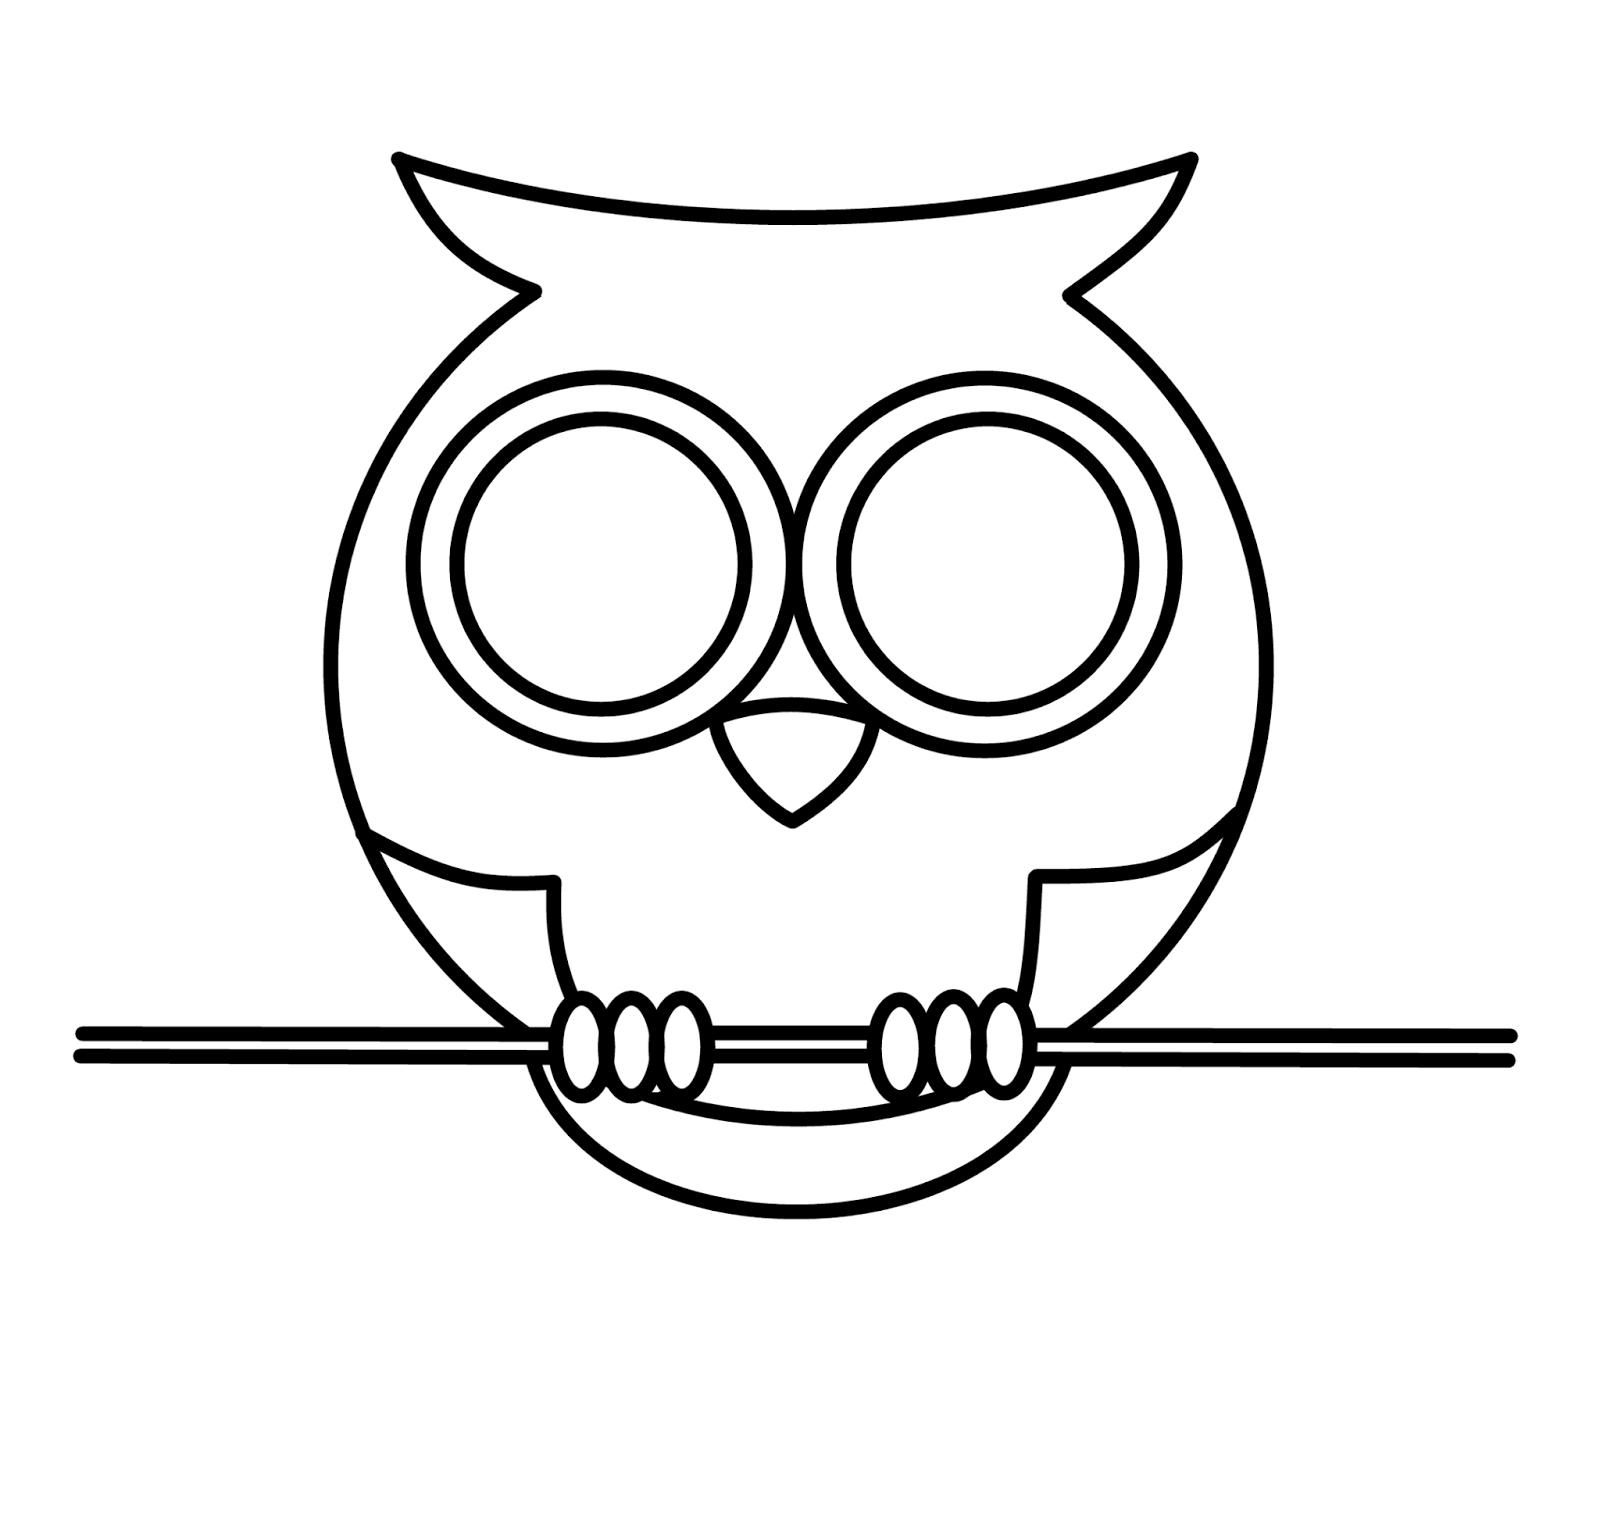 1600x1525 How To Draw Cartoons Owl